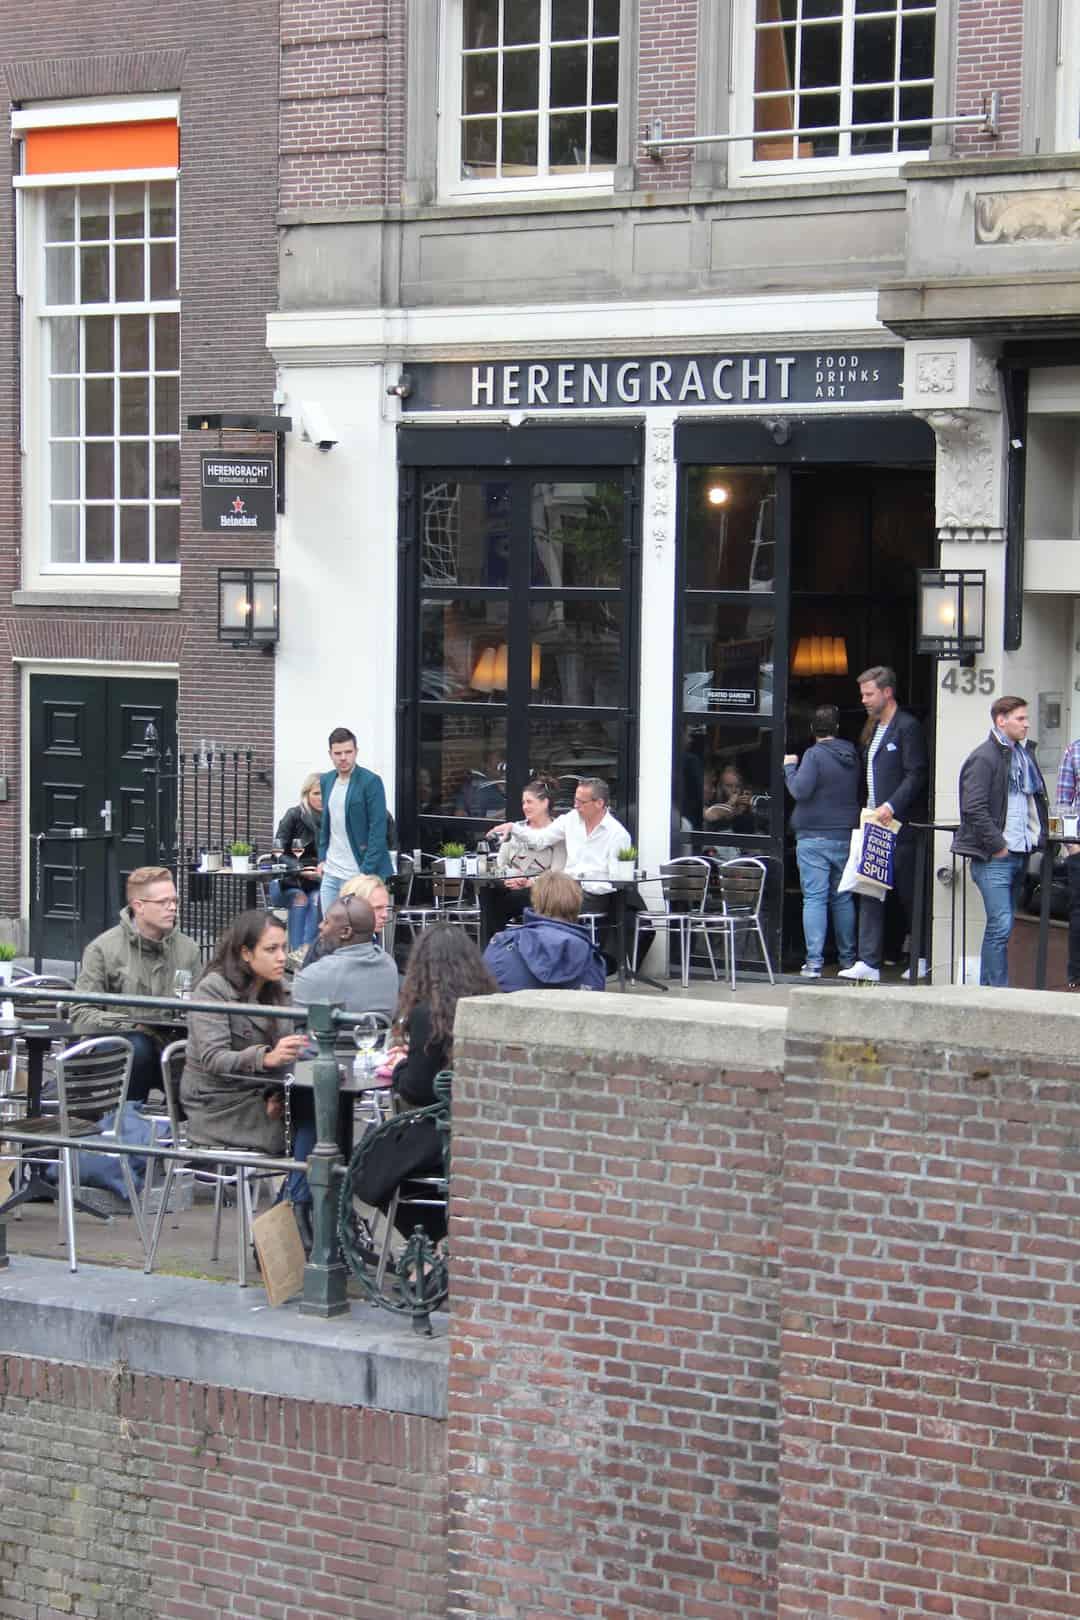 Restaurant bar herengracht amsterdam enjoy the good life for Herengracht amsterdam